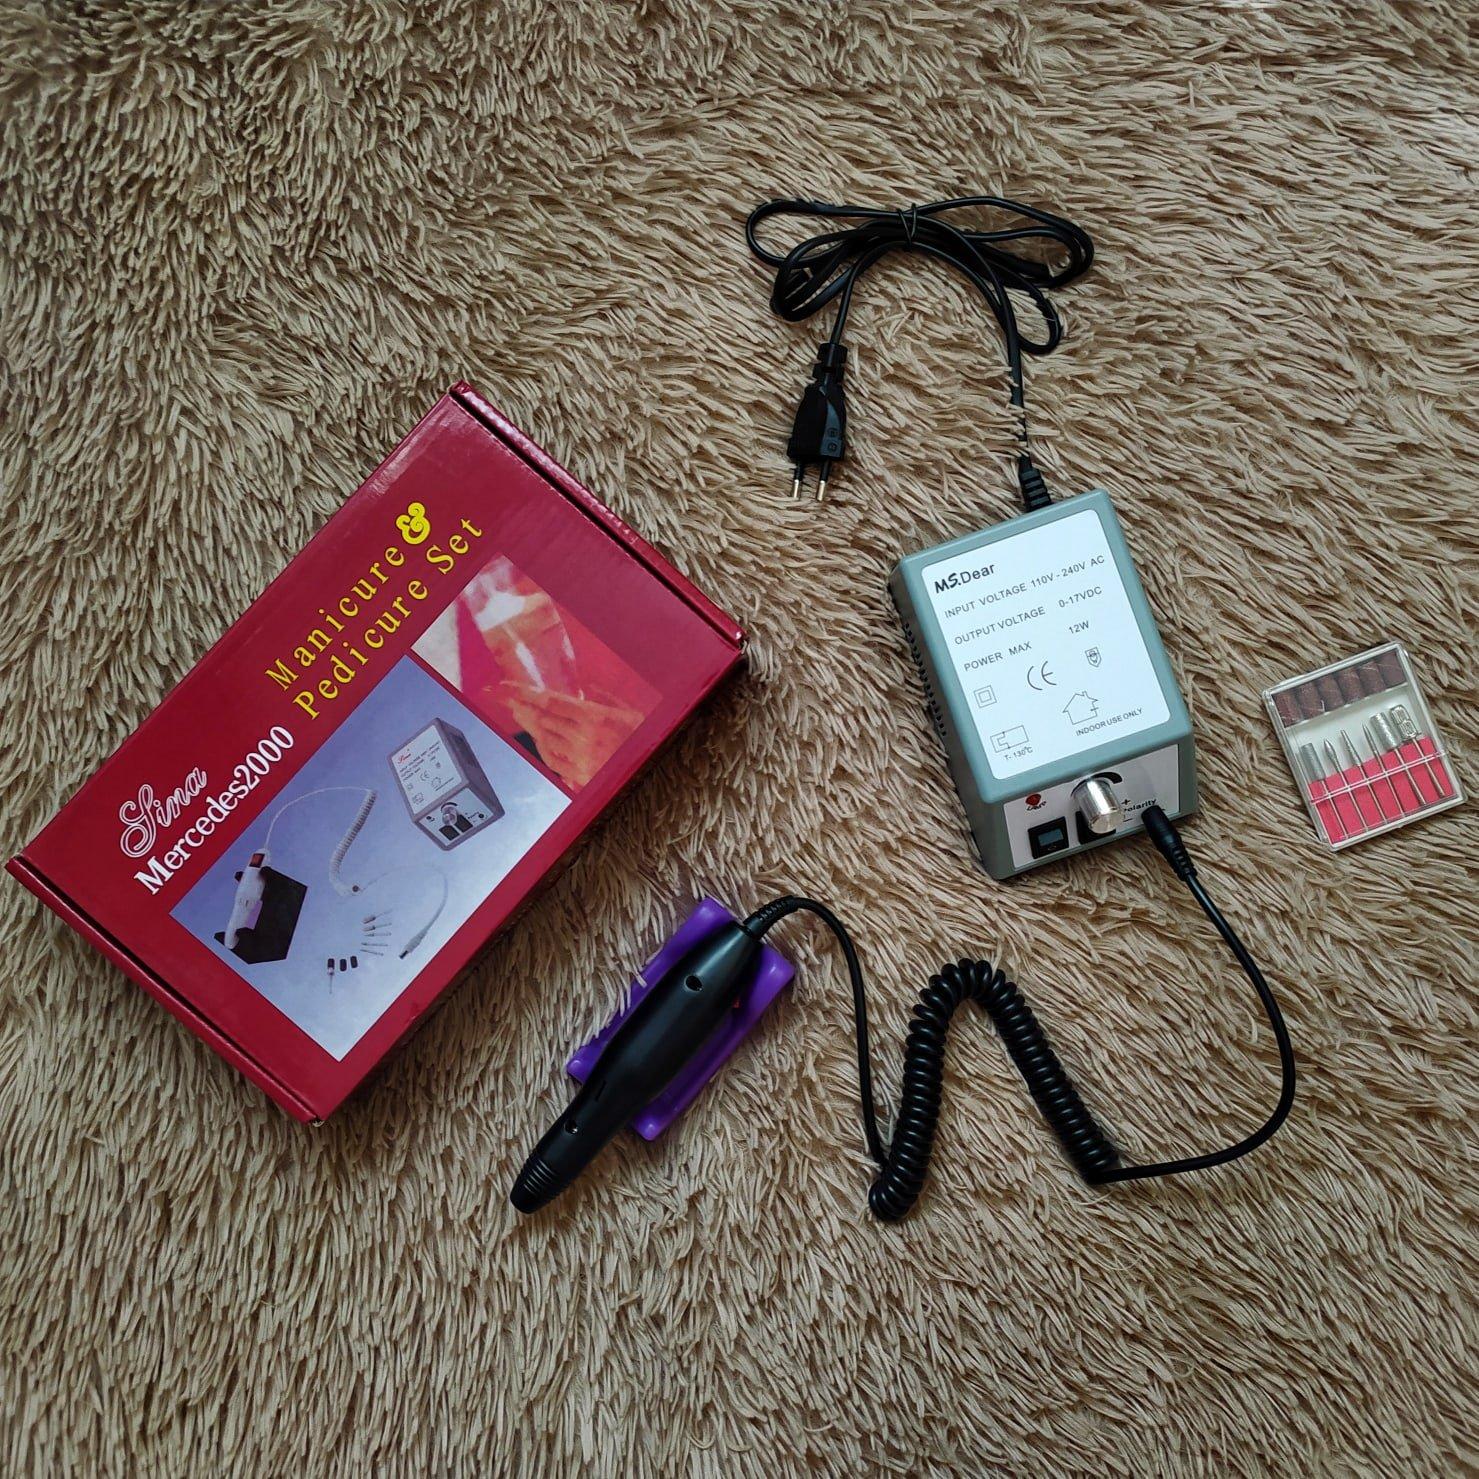 Аппарат для маникюра/педикюра MS. DEAR 11024 - отзывы